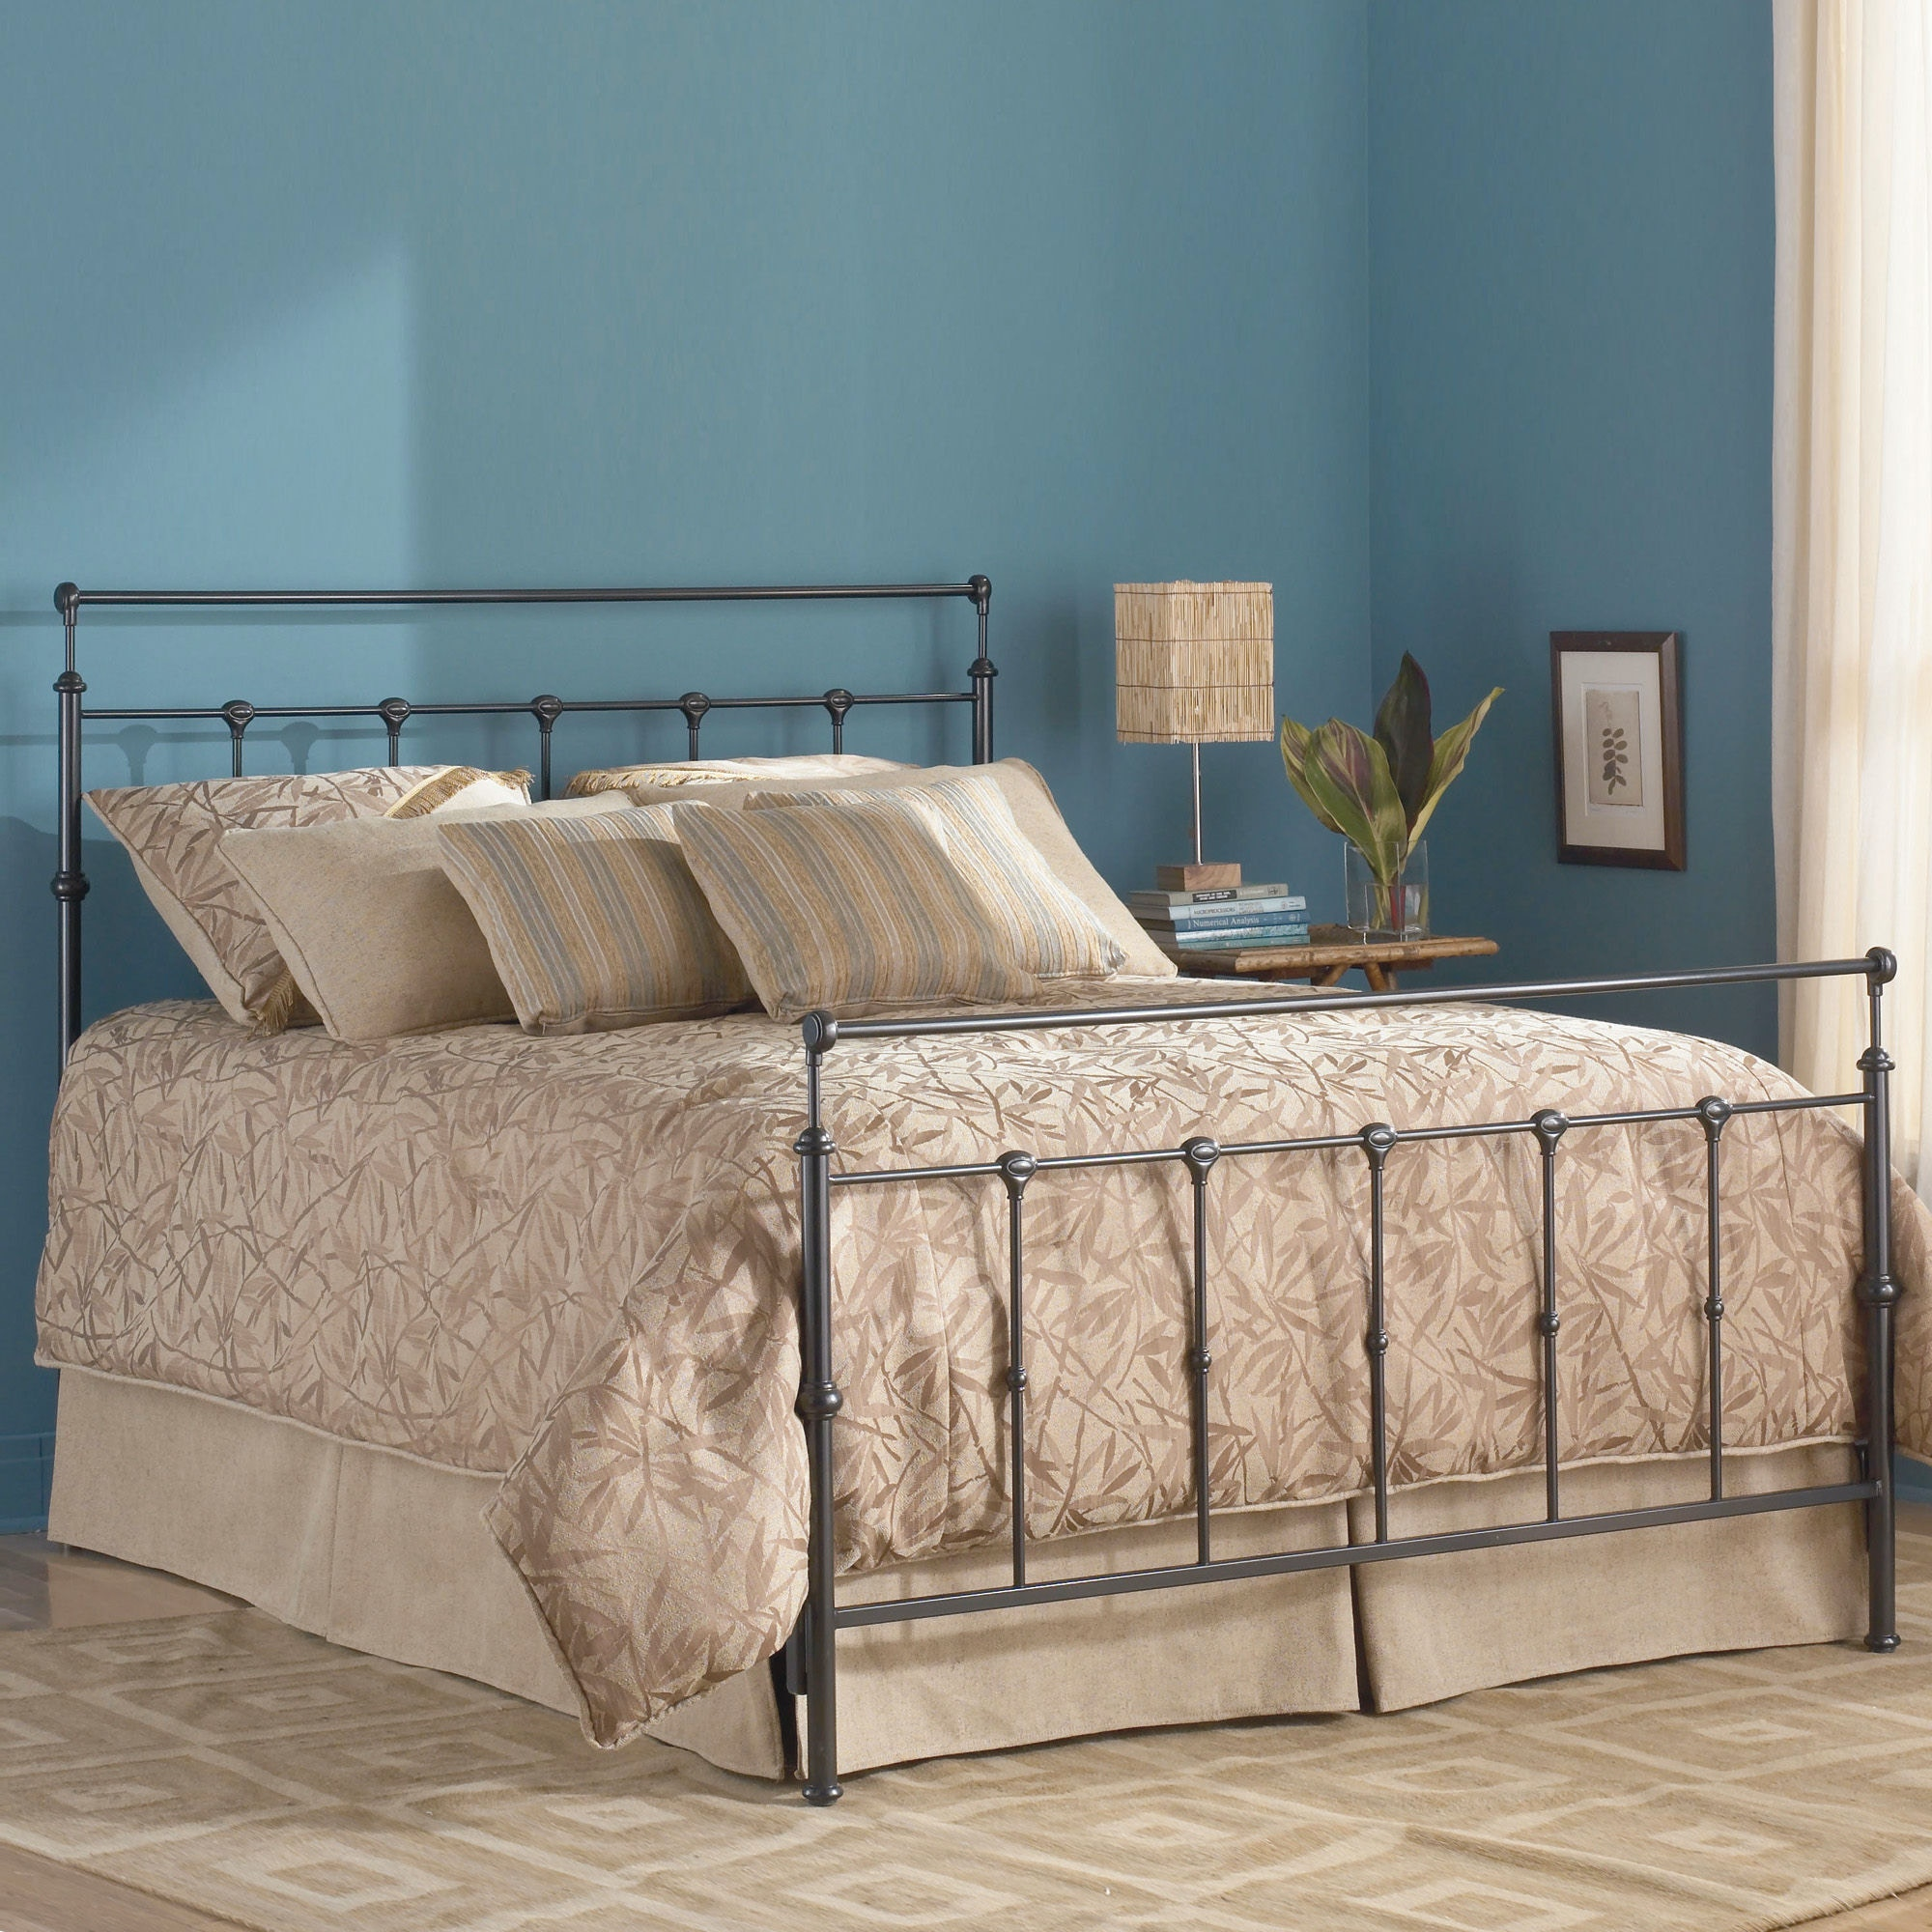 Fashion Bed Group Winslow 6/6 B Mahogany Golden B40156